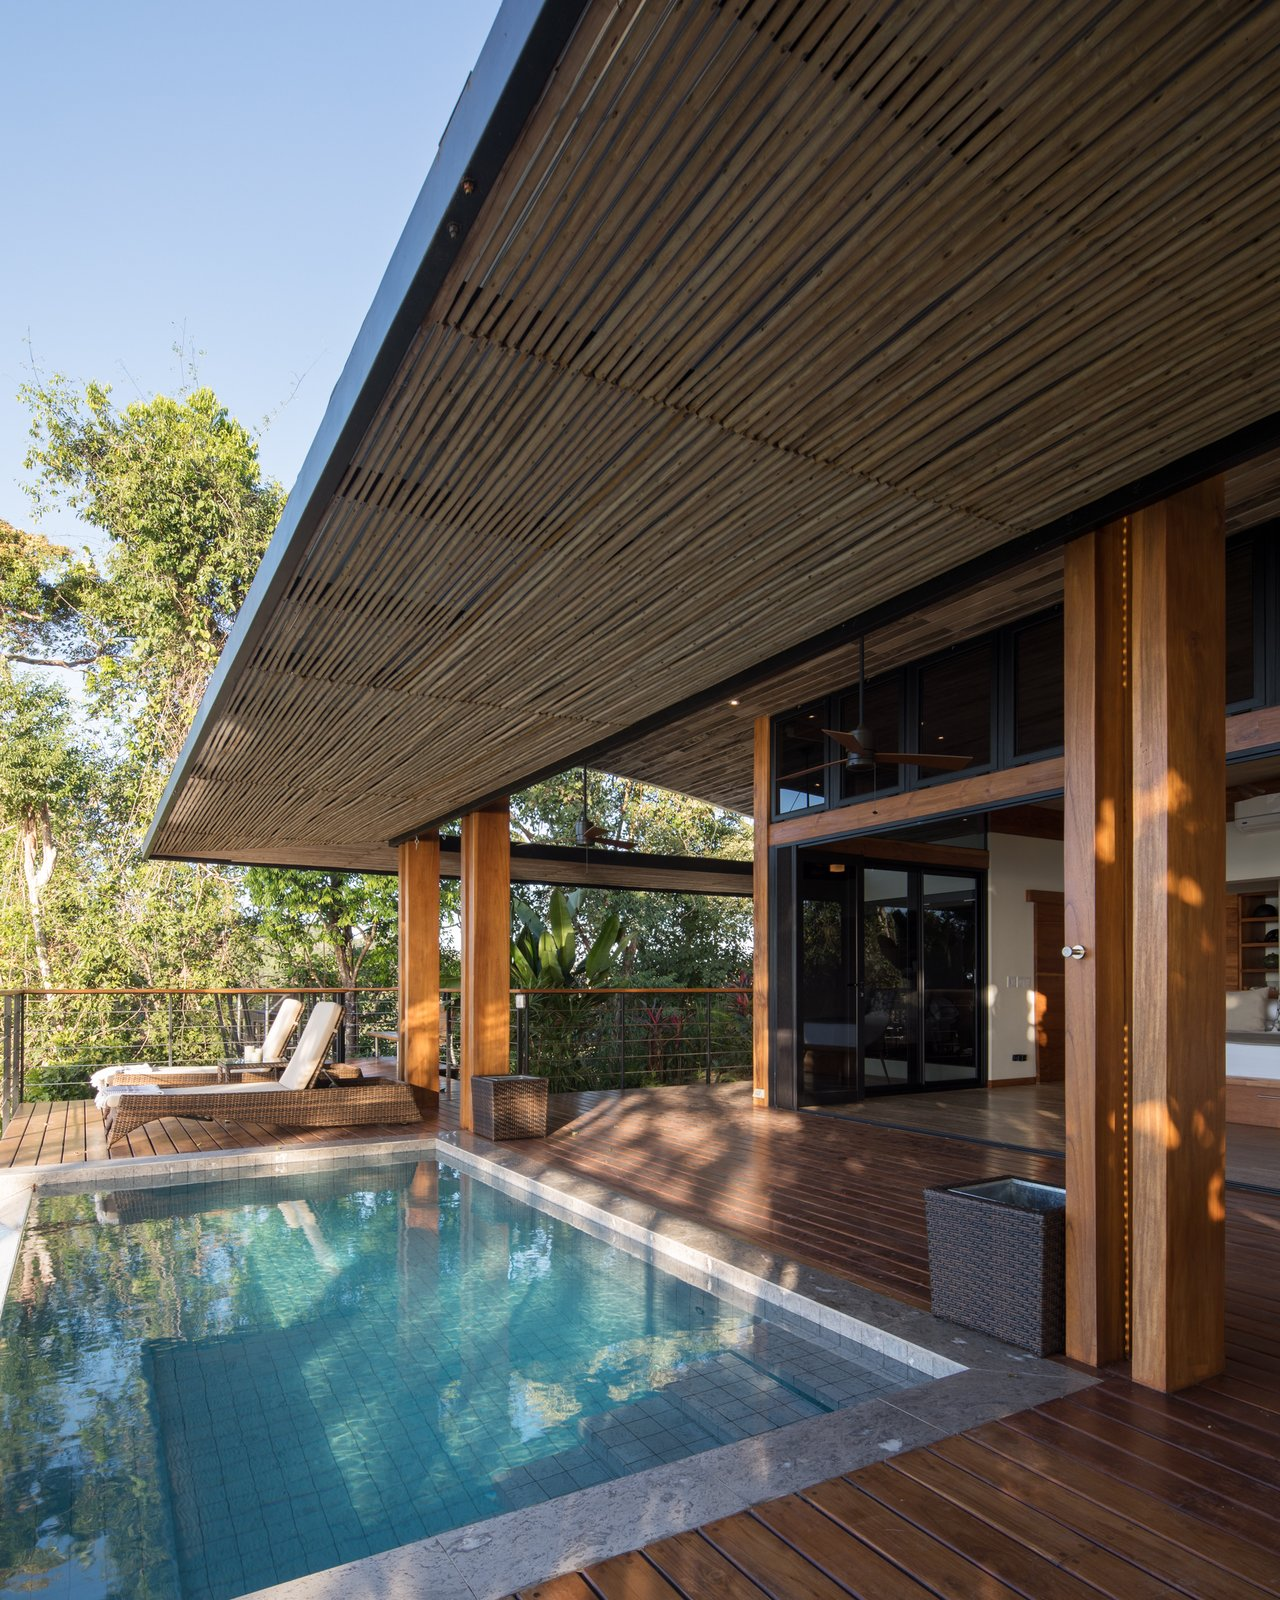 Pool an deck